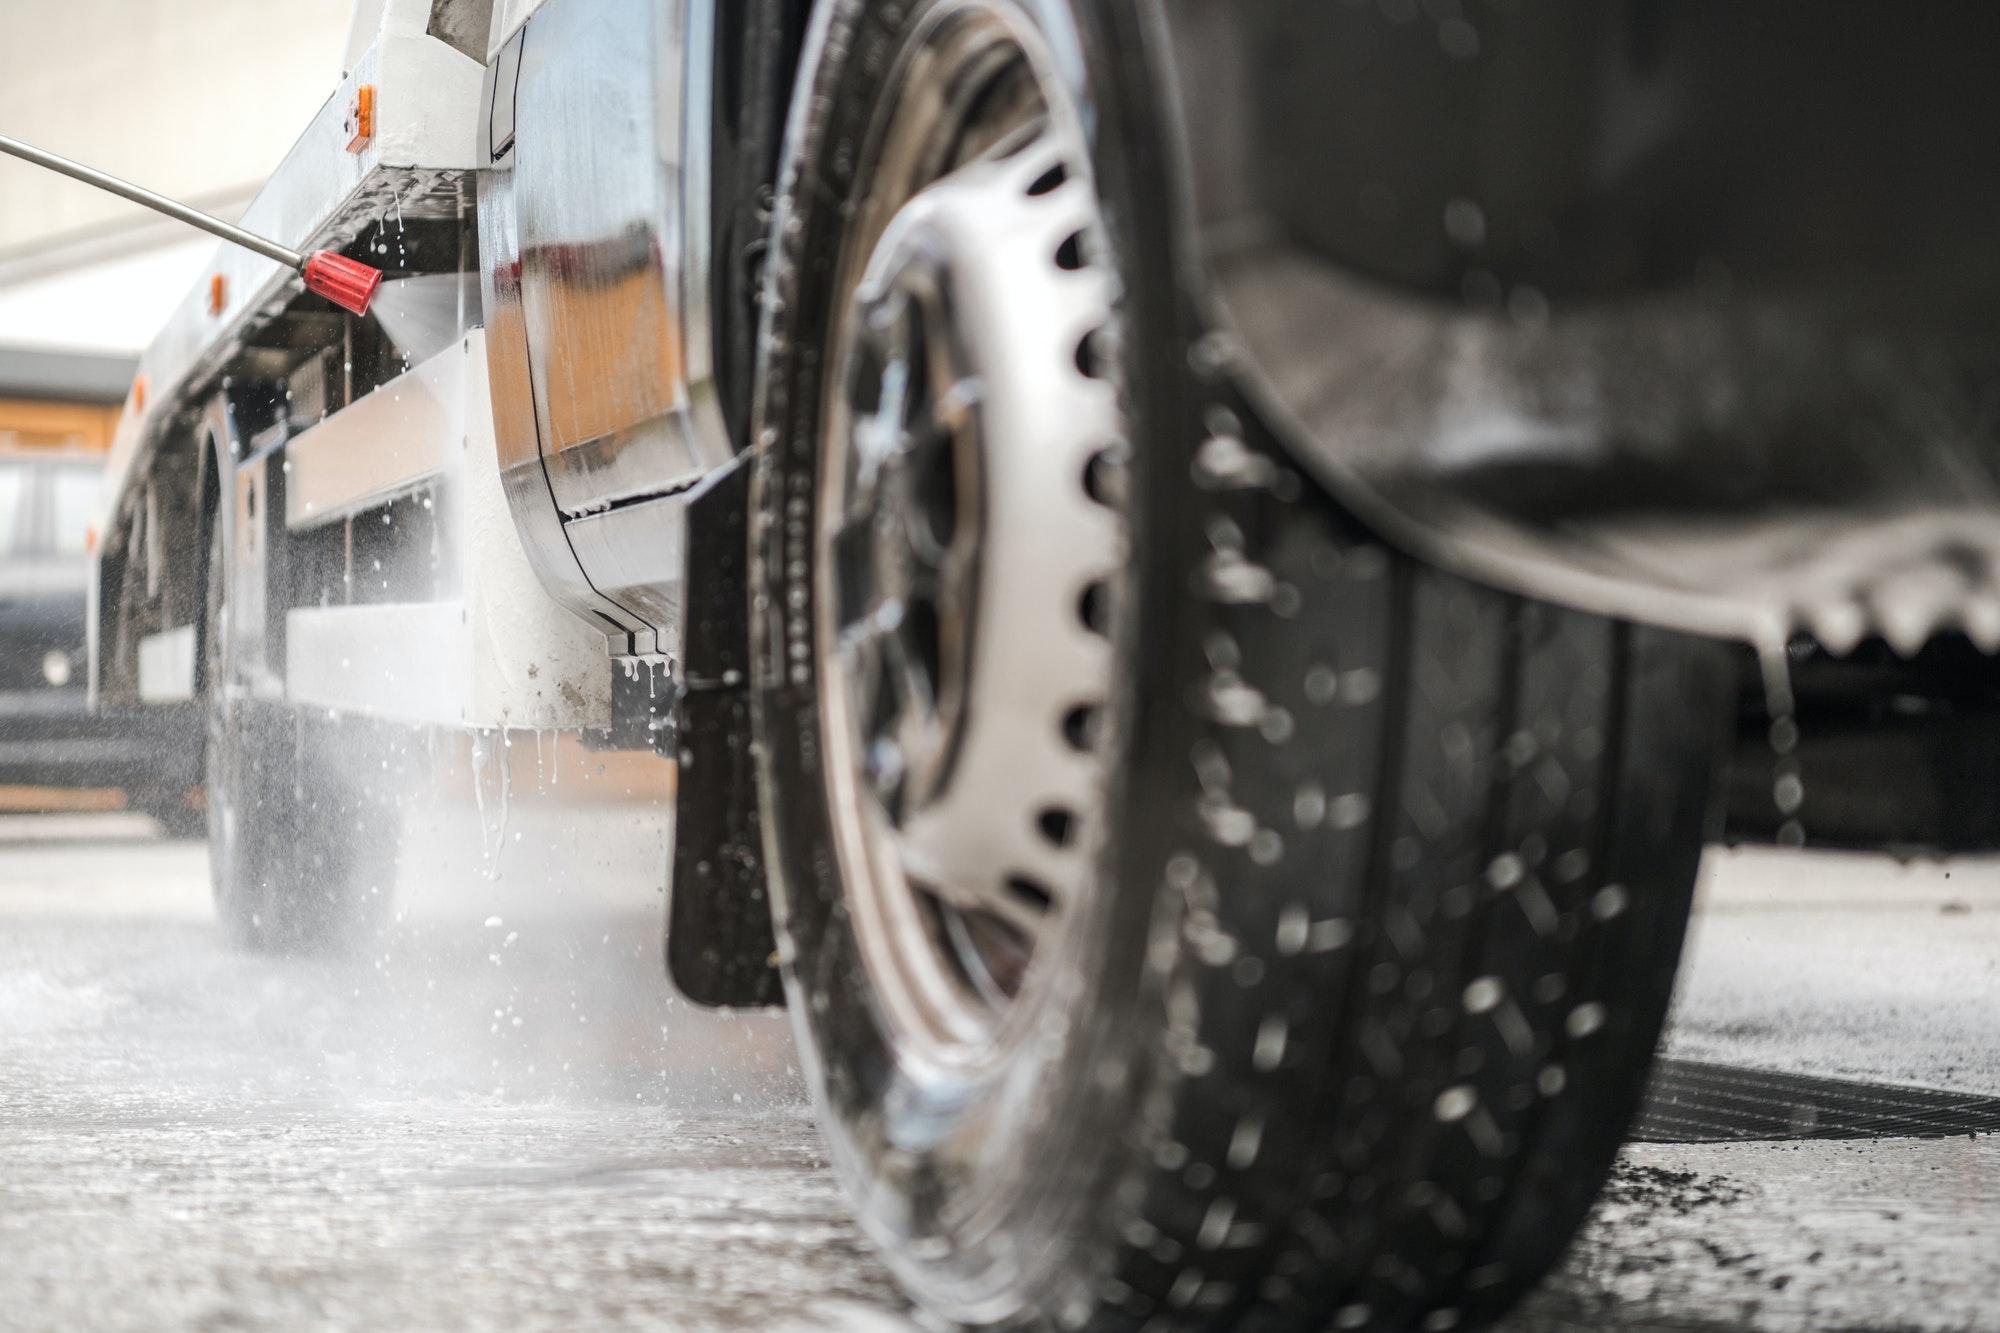 Manual Pressure Washing Truck In Car Wash.